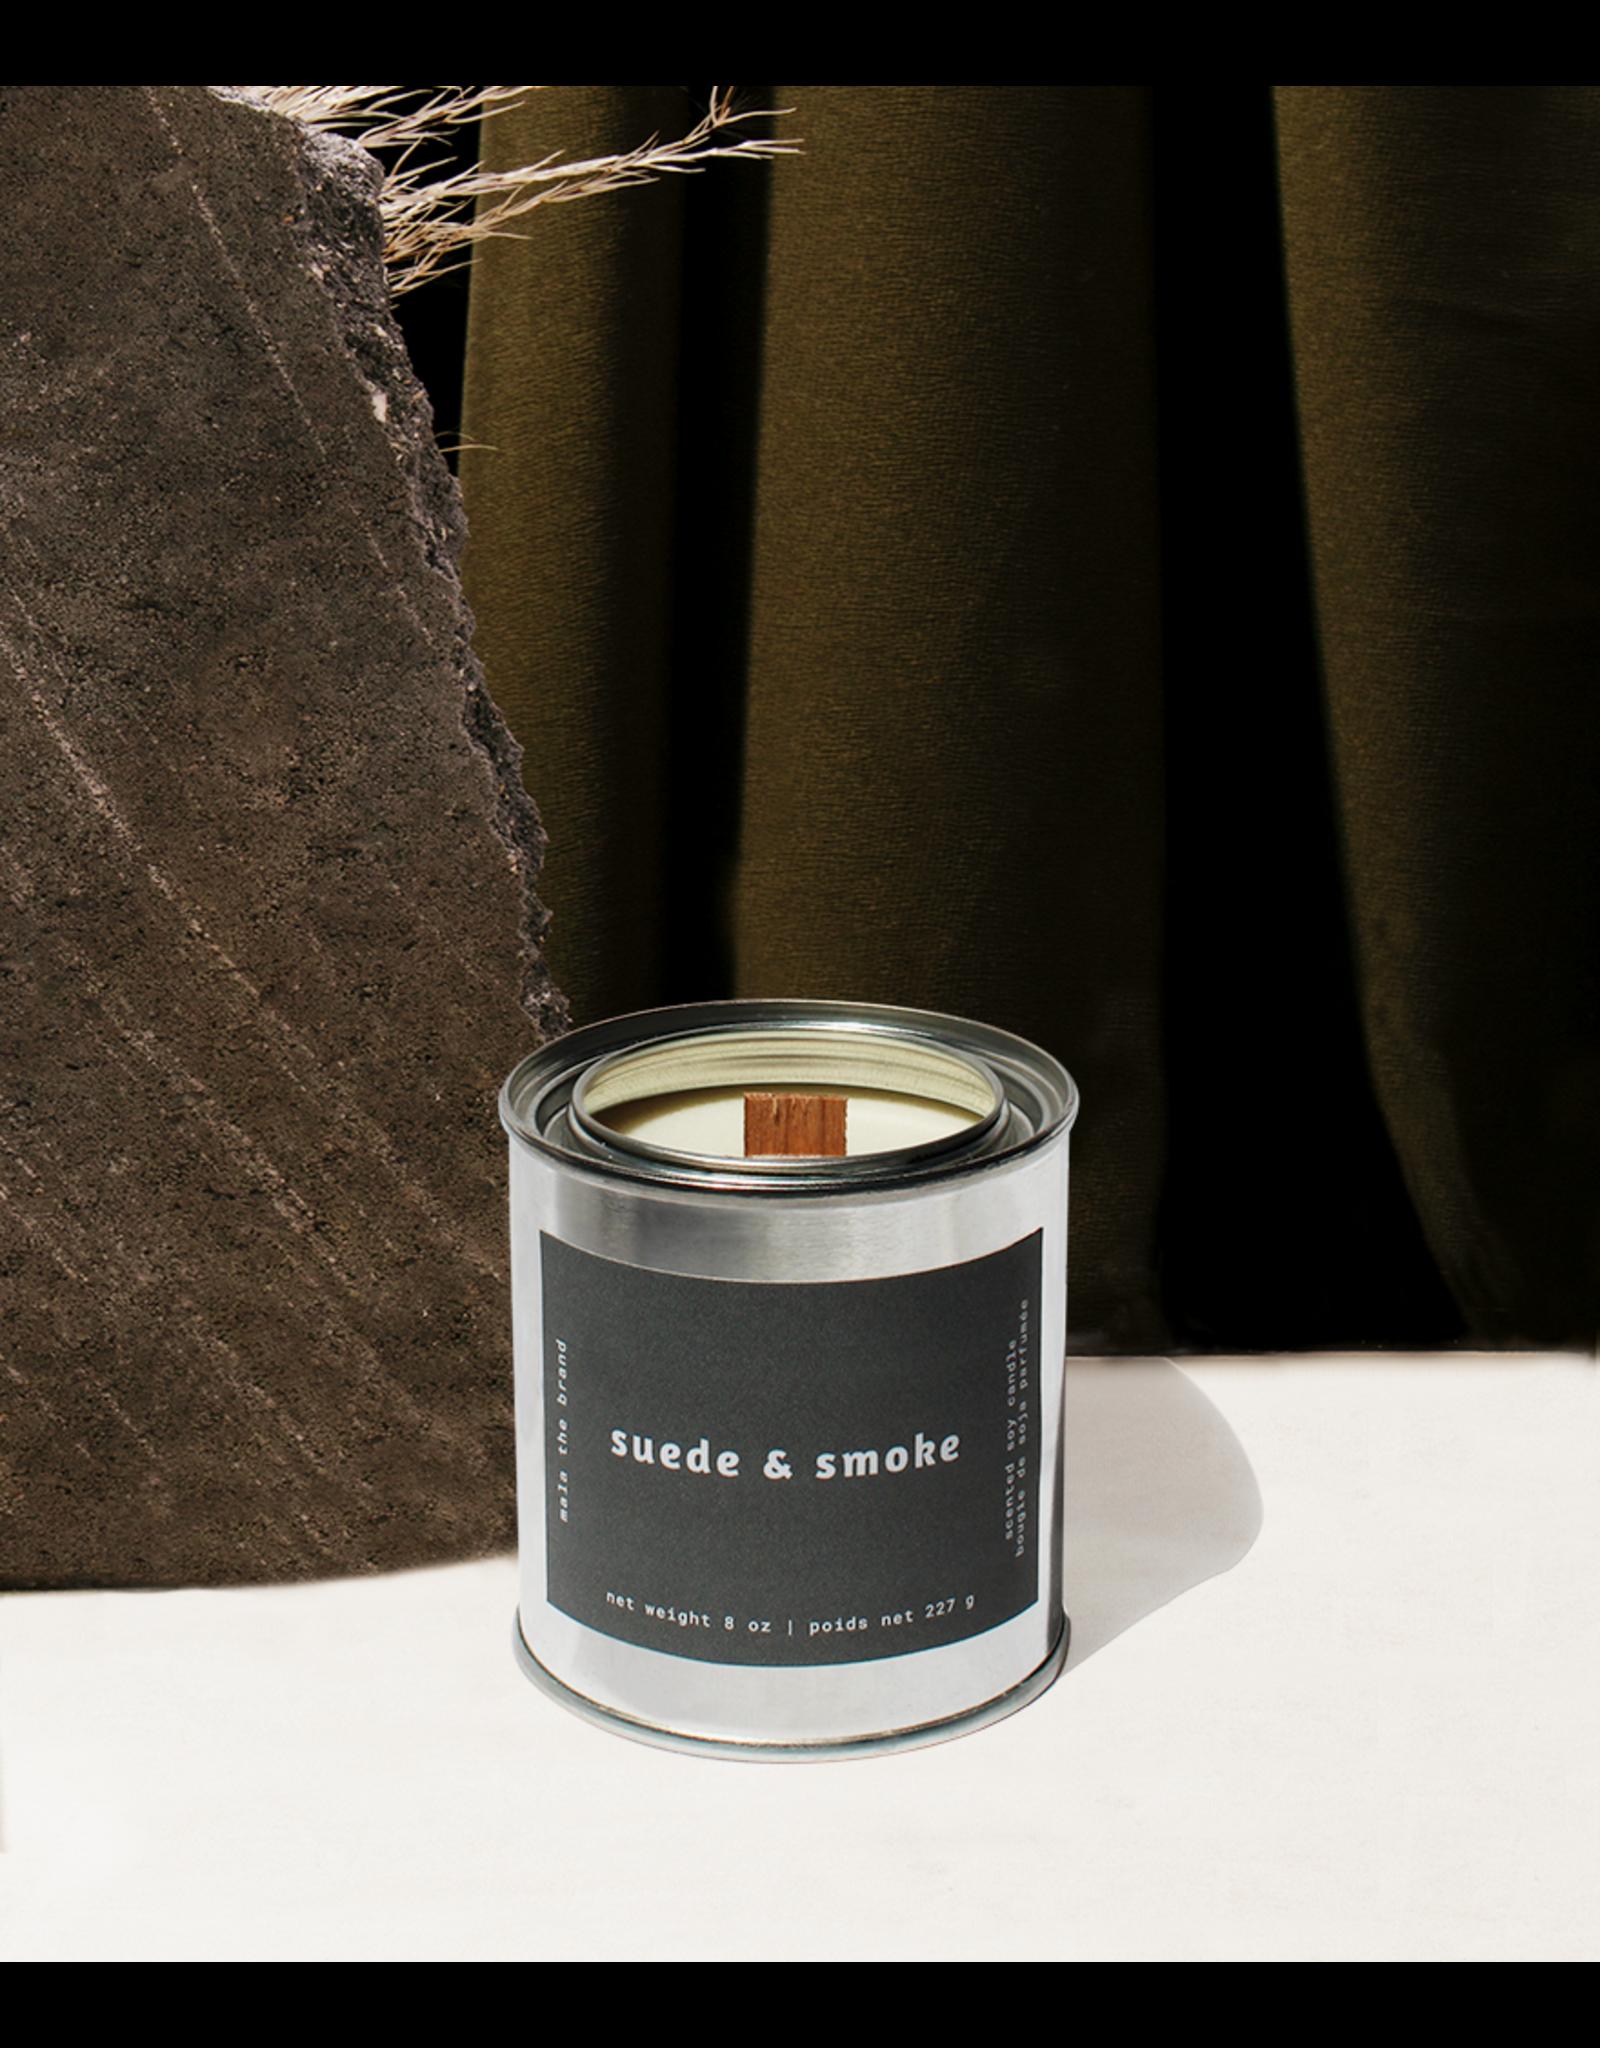 Mala The Brand Suede & Smoke Candle / Saffron + Vetiver + Cedarwood